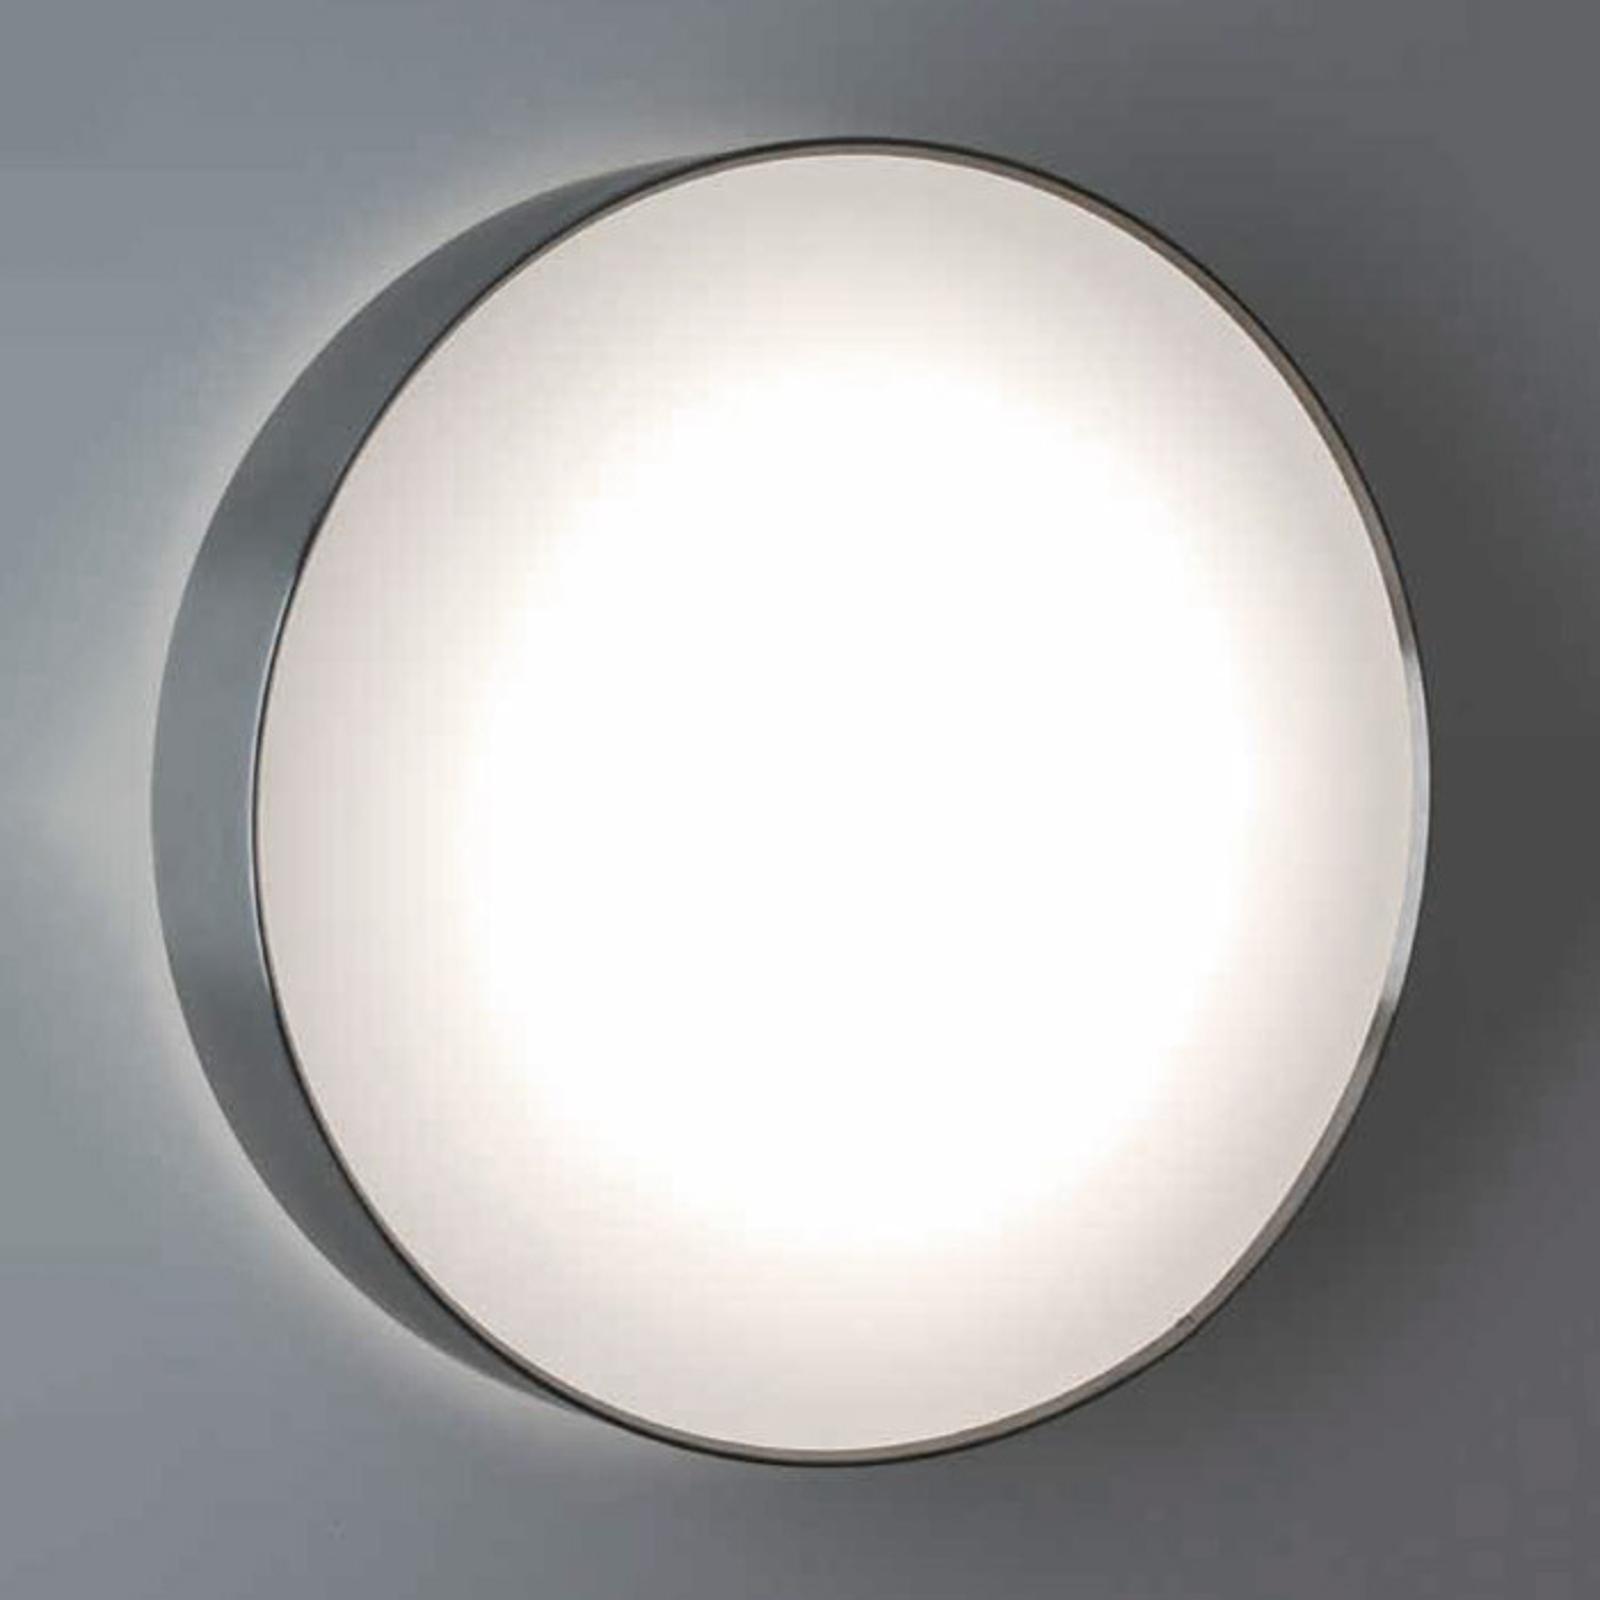 Applique acier inoxydable SUN 4 LED, 8W 4K